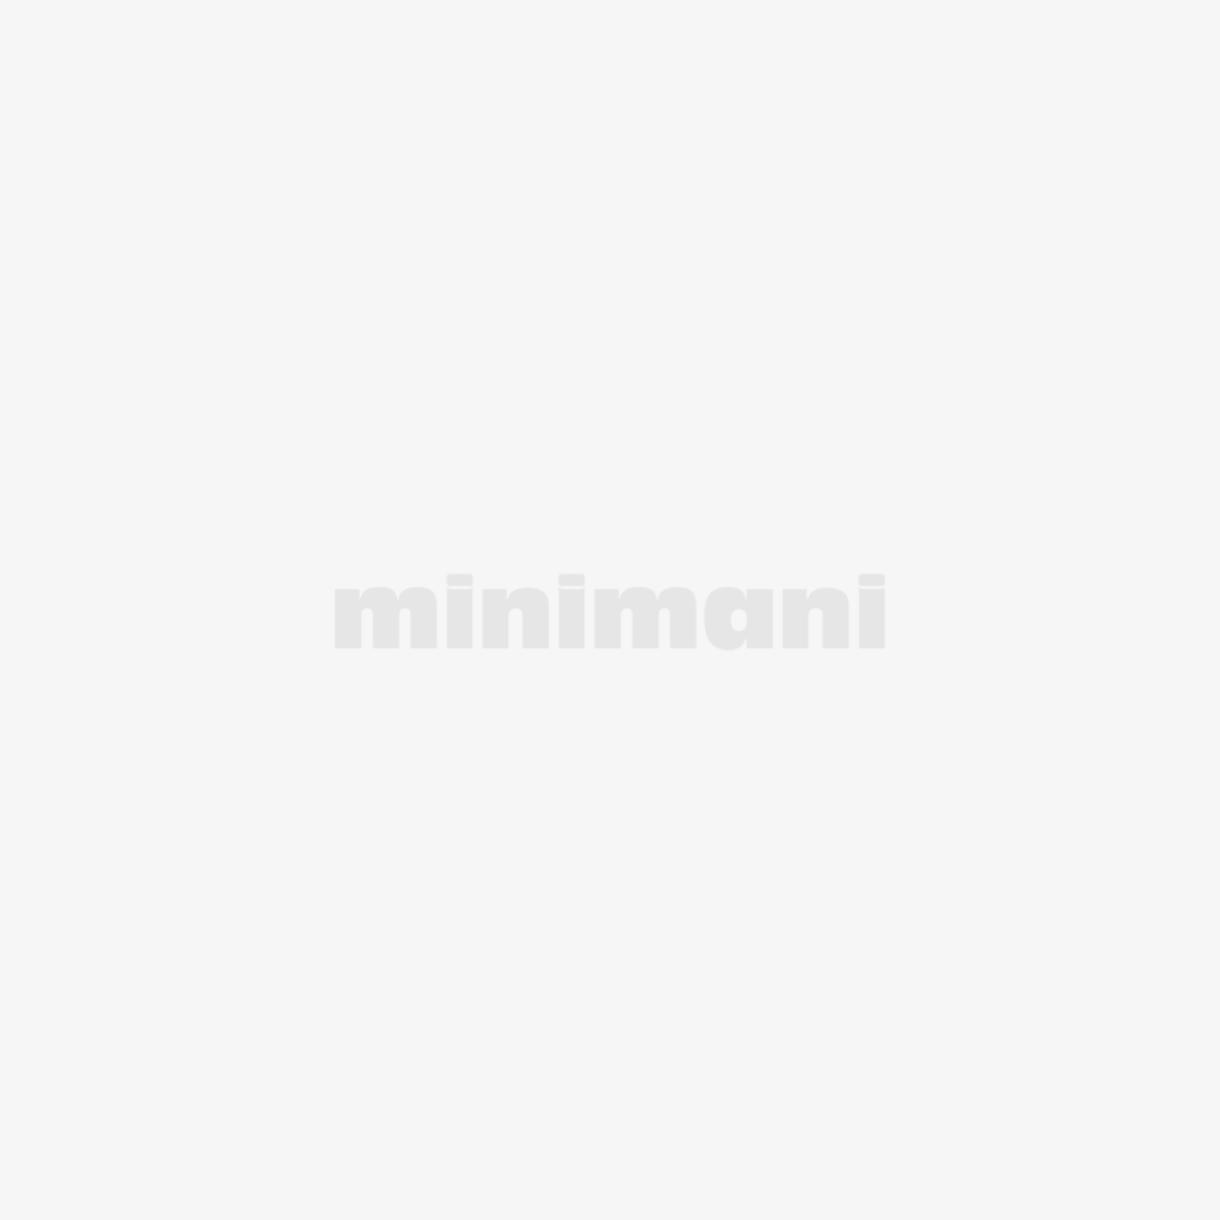 M-FILTER RAITISILMASUODATIN MAC 8002 AUDI, SEAT, SKODA, VW